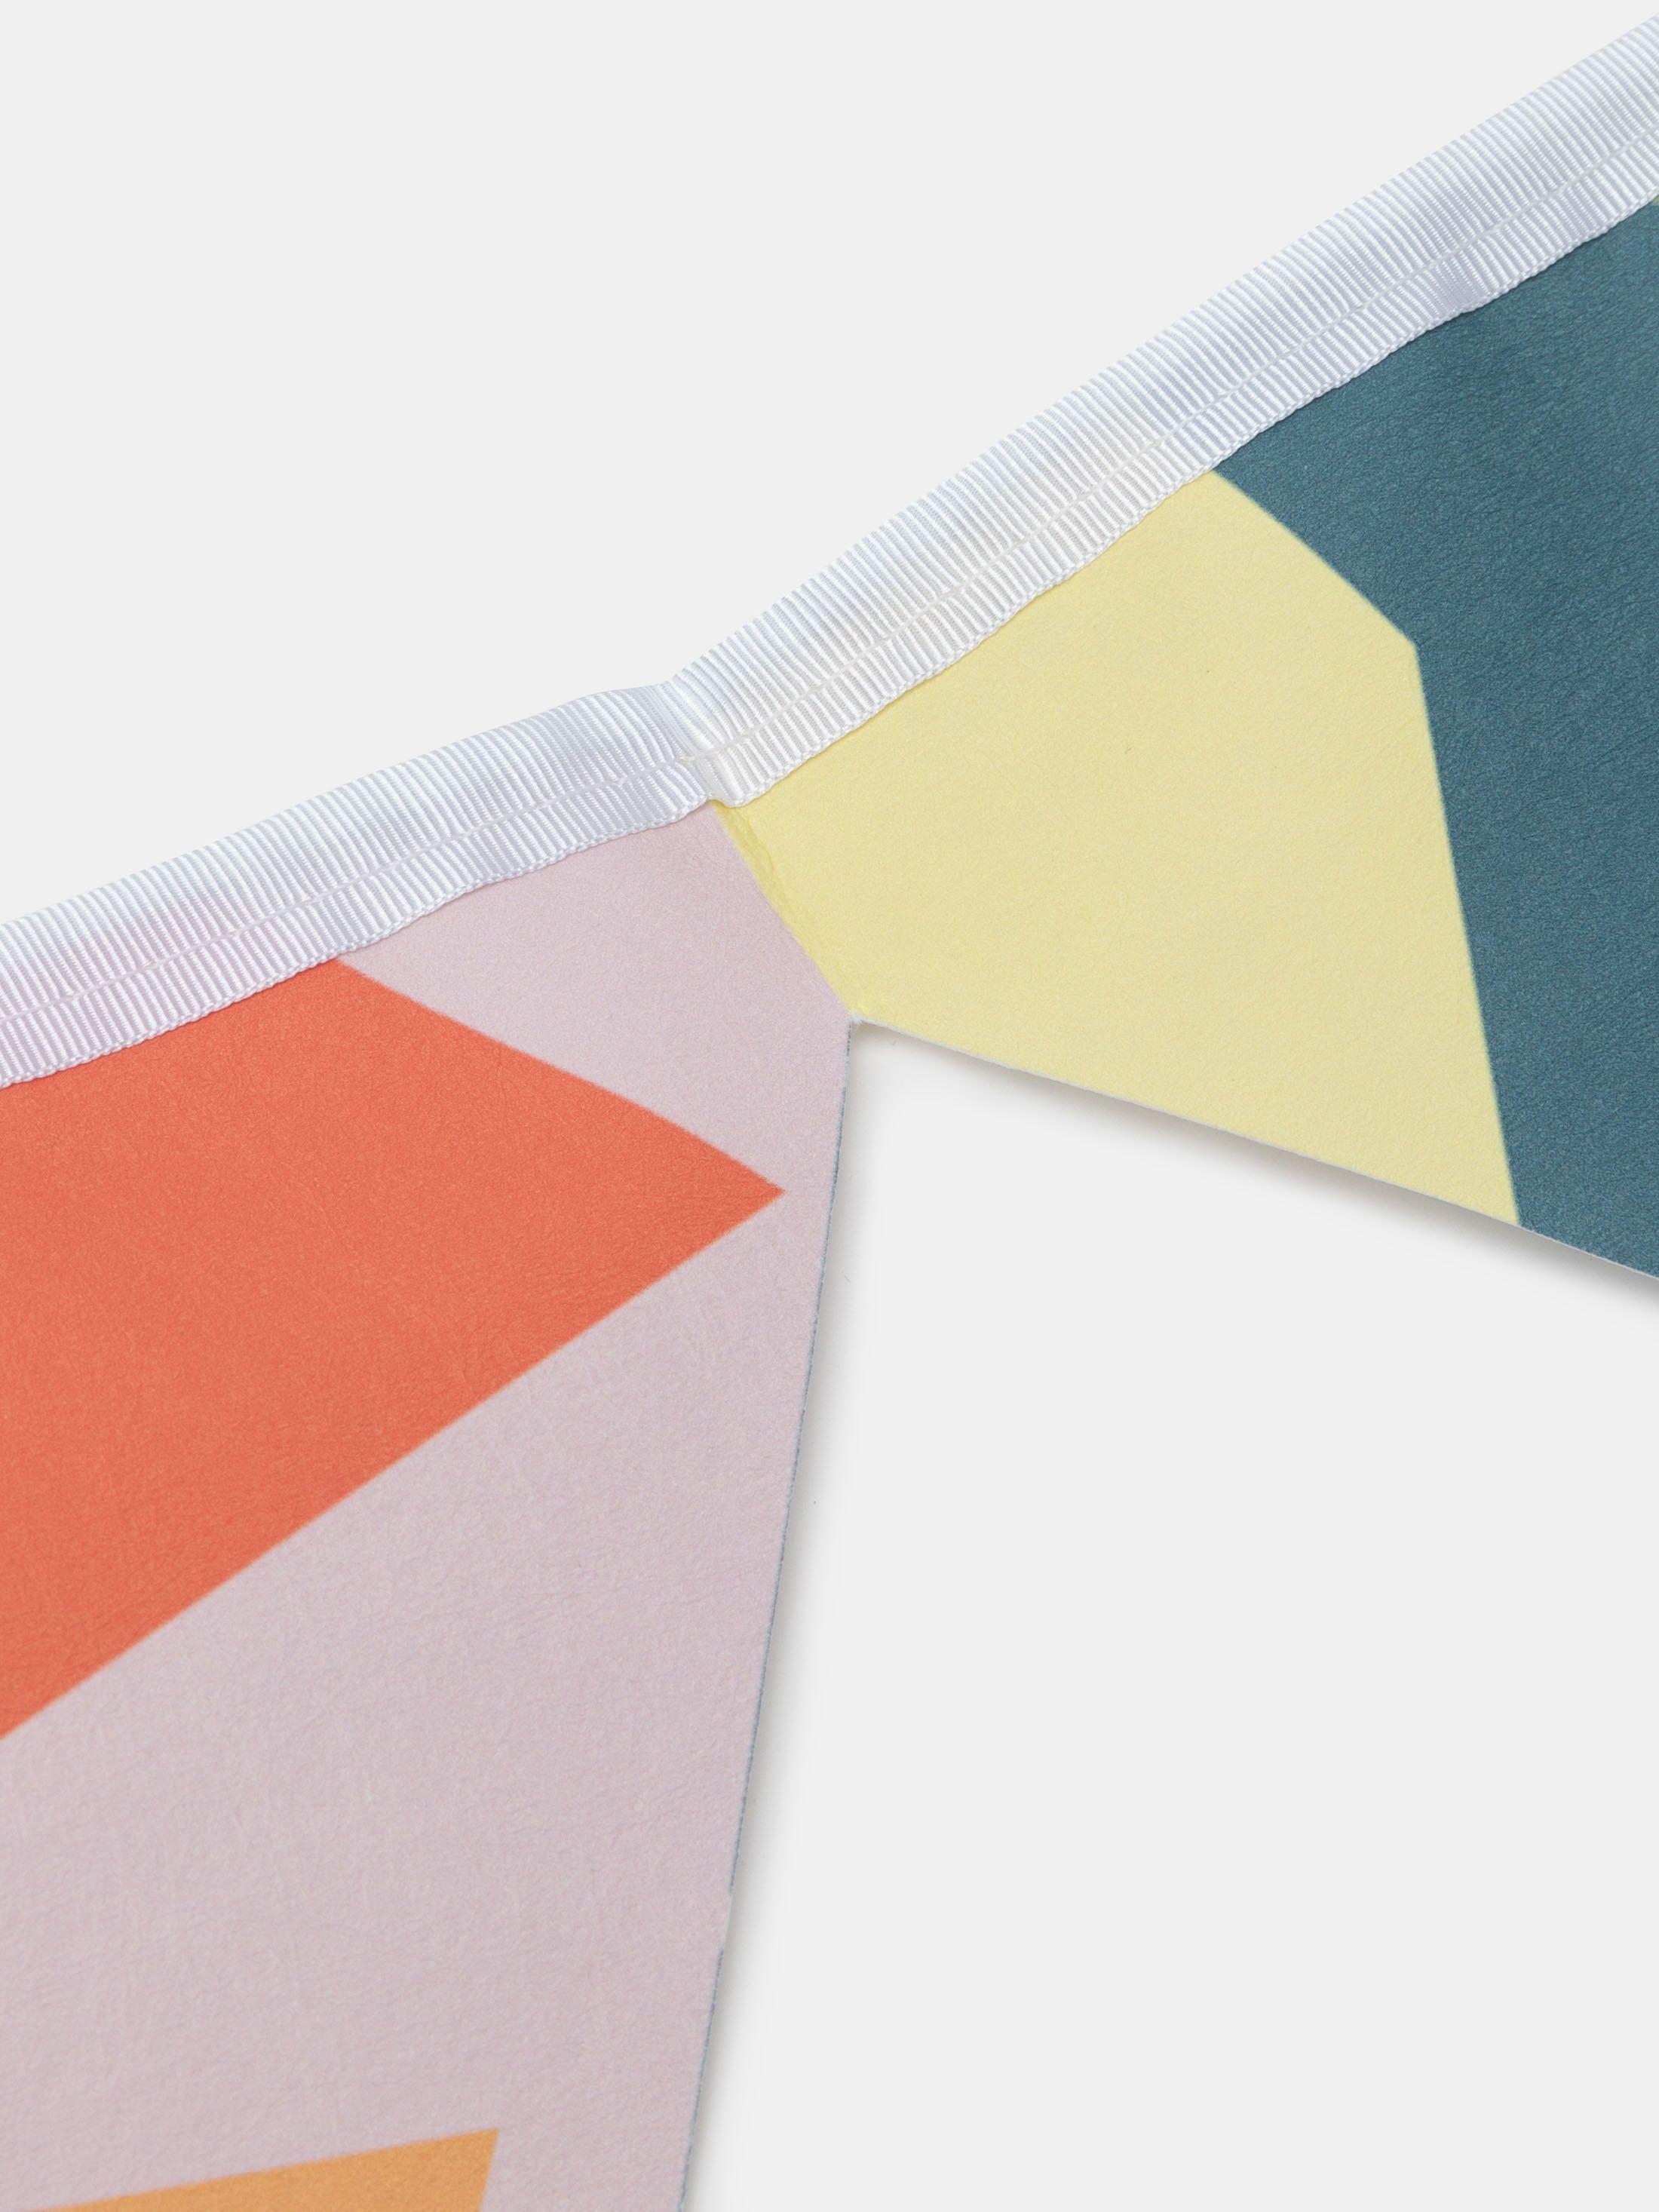 Impression sur guirlande format triangulaire